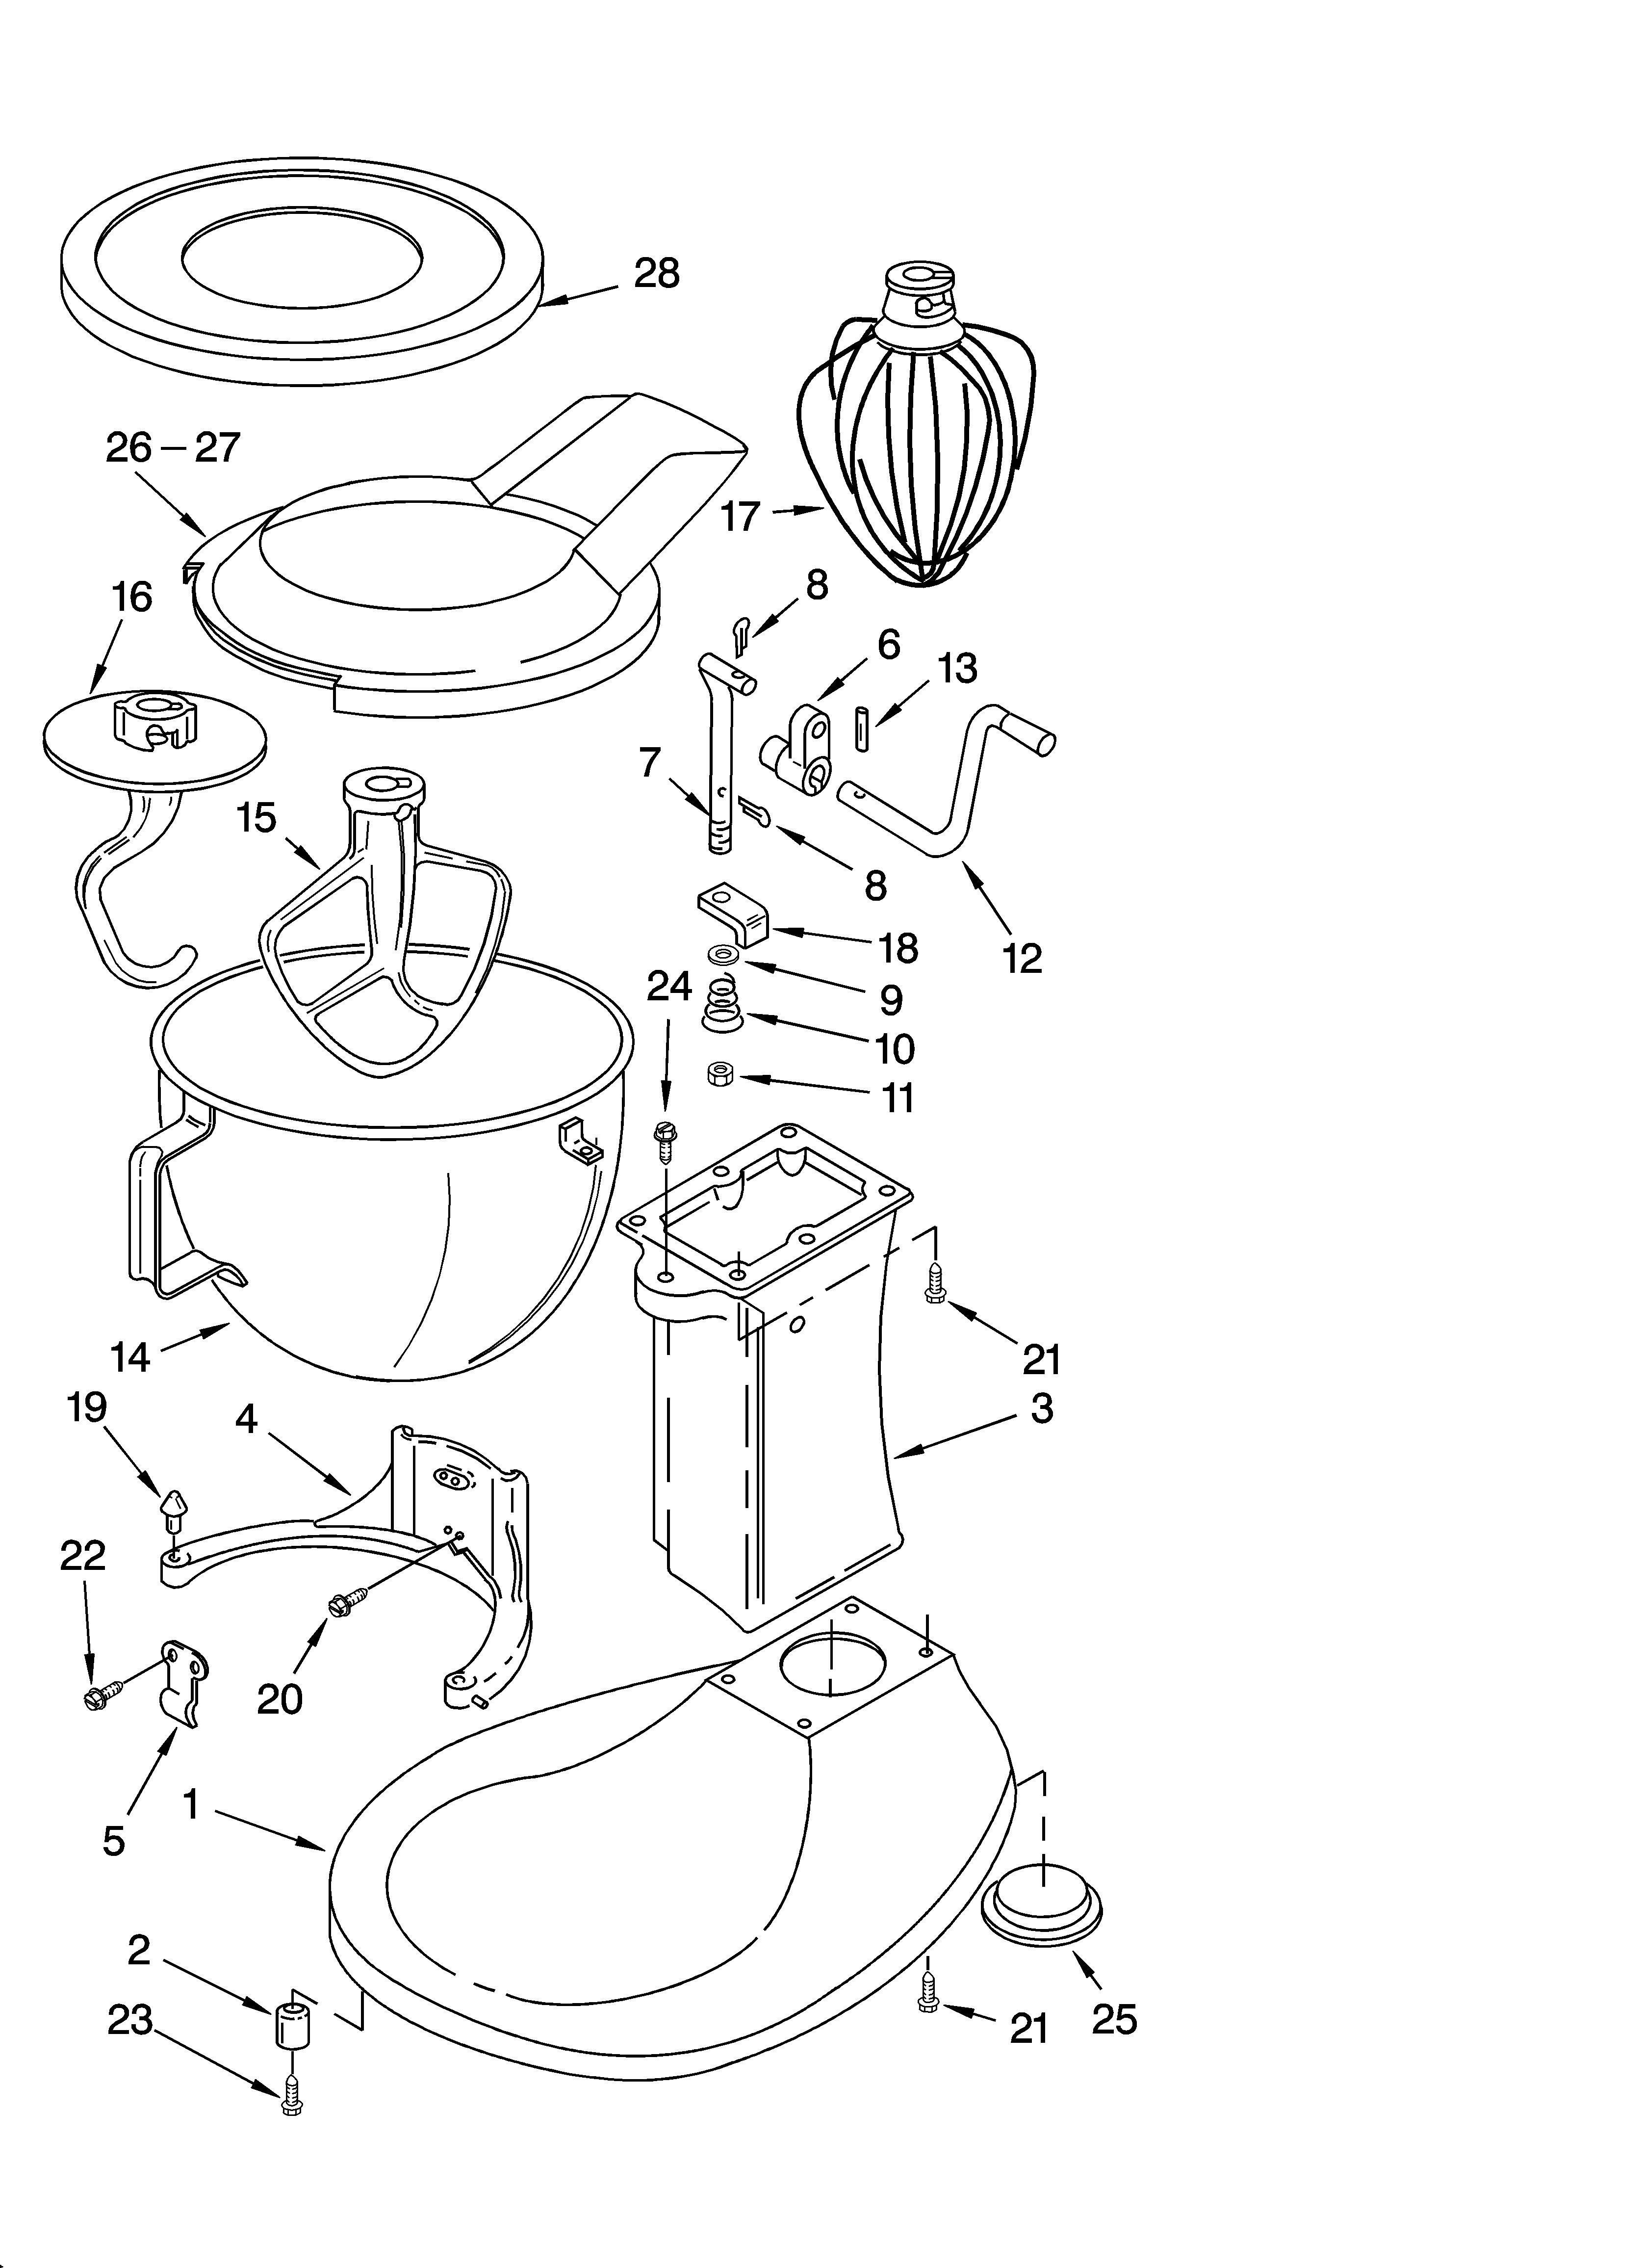 hight resolution of base and pedestal unit diagram parts list for model k5ss kitchenaid parts mixer